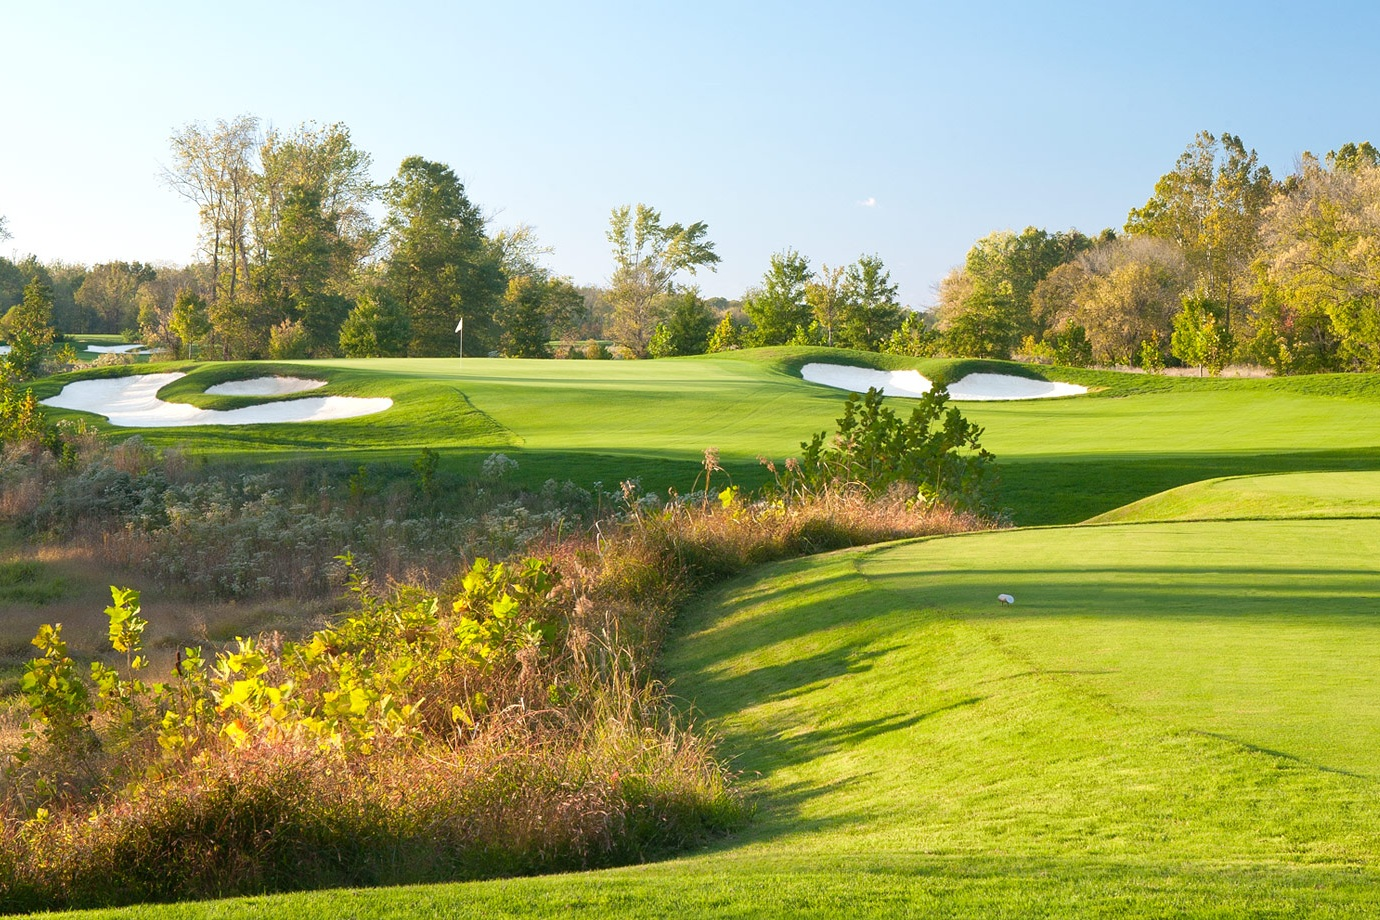 Landsdowne - Leesburg, Virginia - USA* Private - 18 holeswww.golfatlandsdowne.com